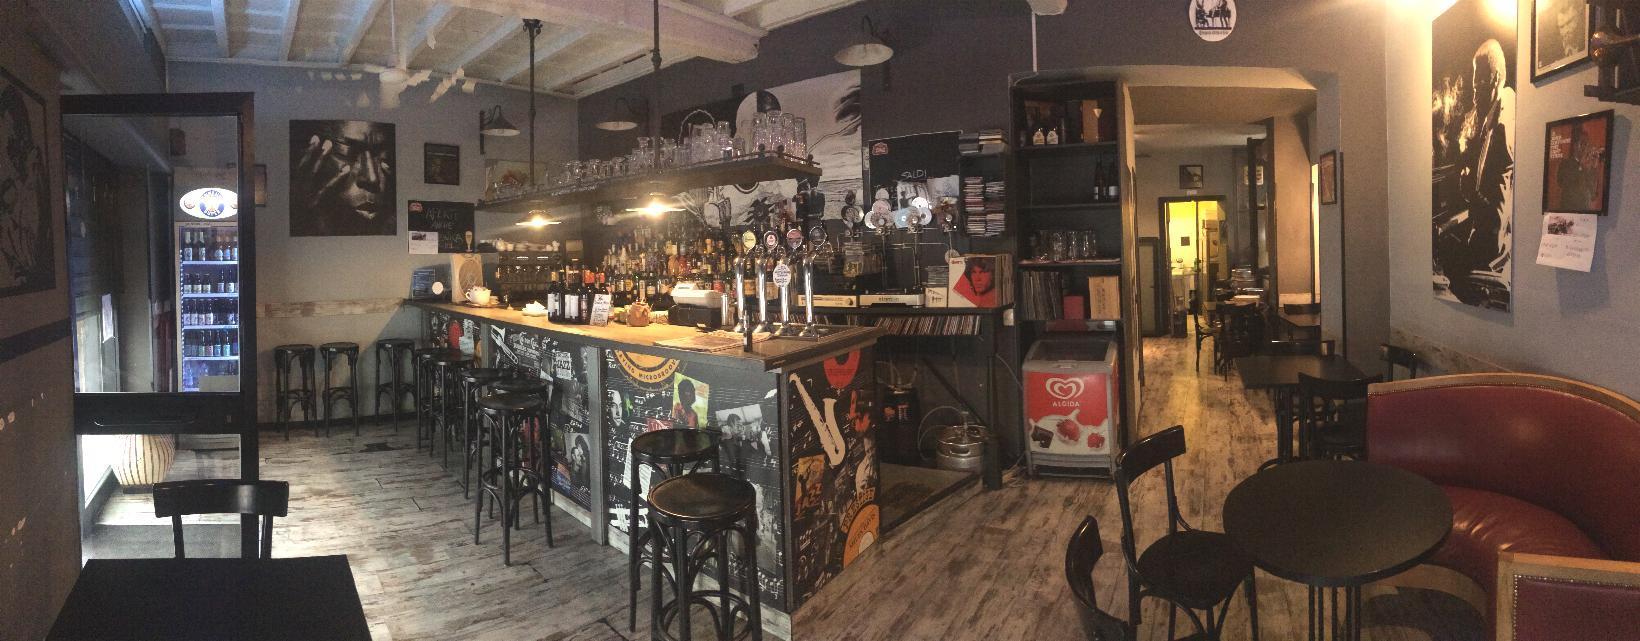 Bar ristorante in Vendita a Monza: 80 mq